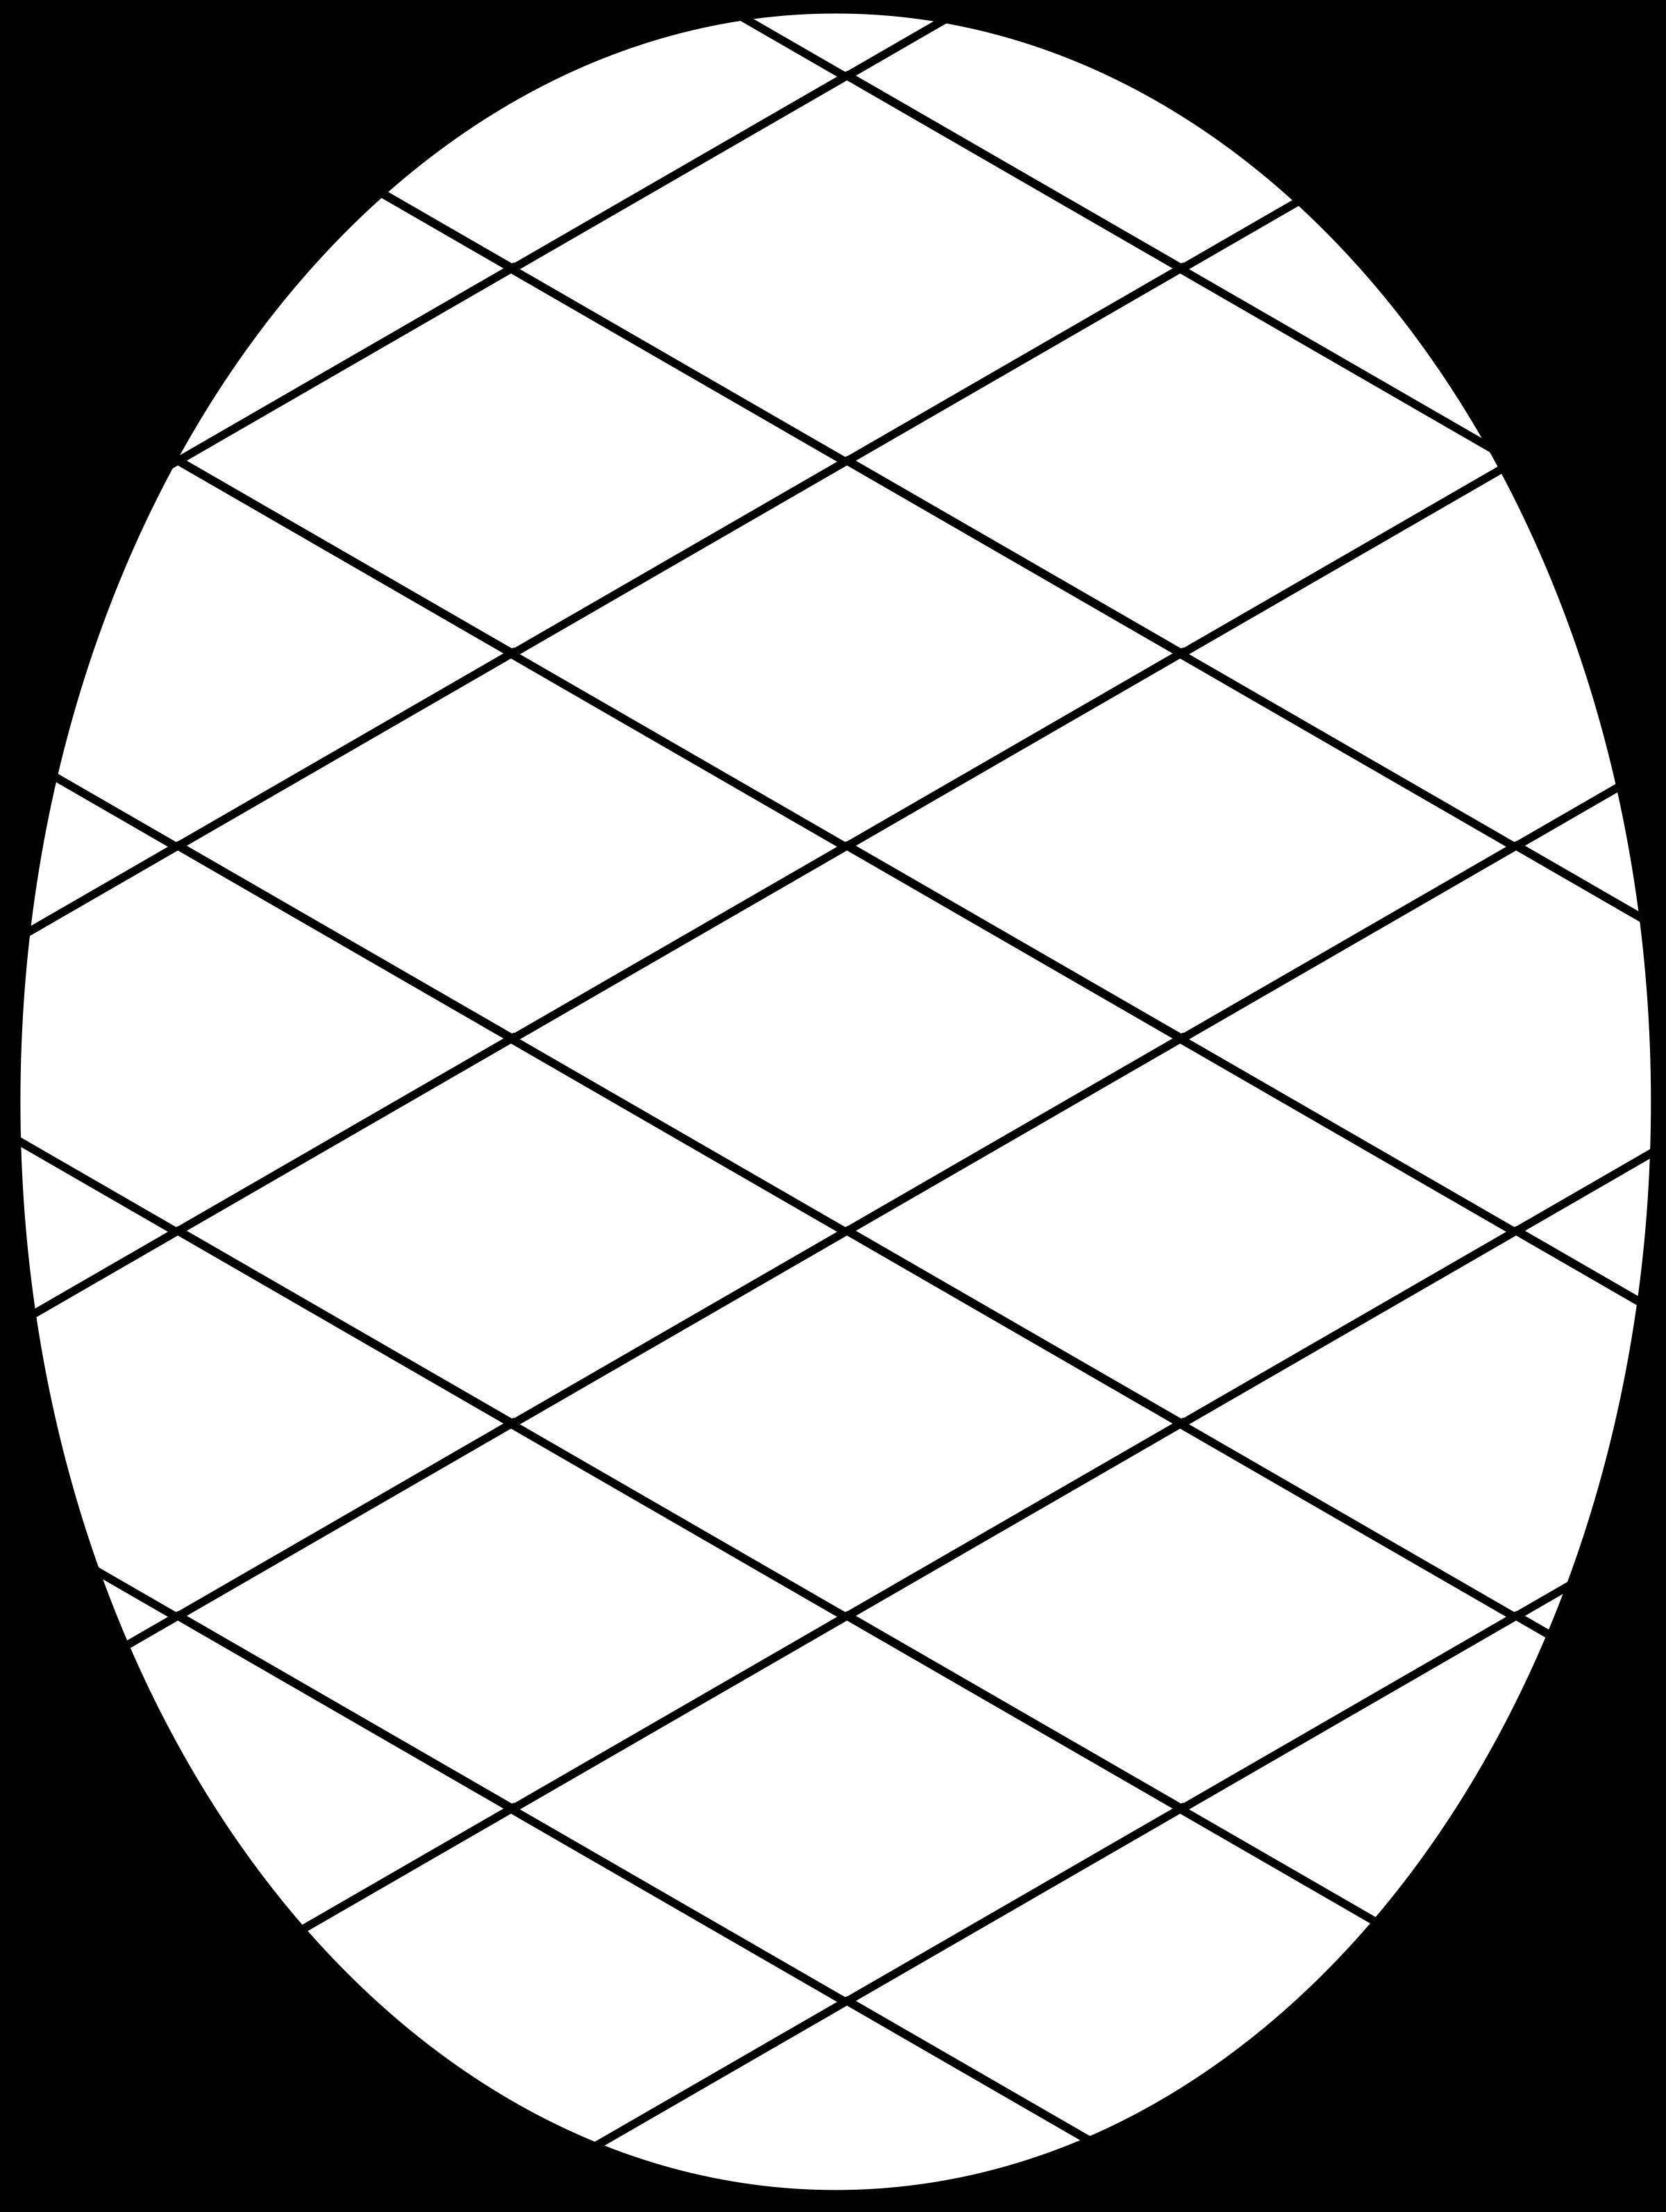 Clipart diamond geometric. Pattern outline big image